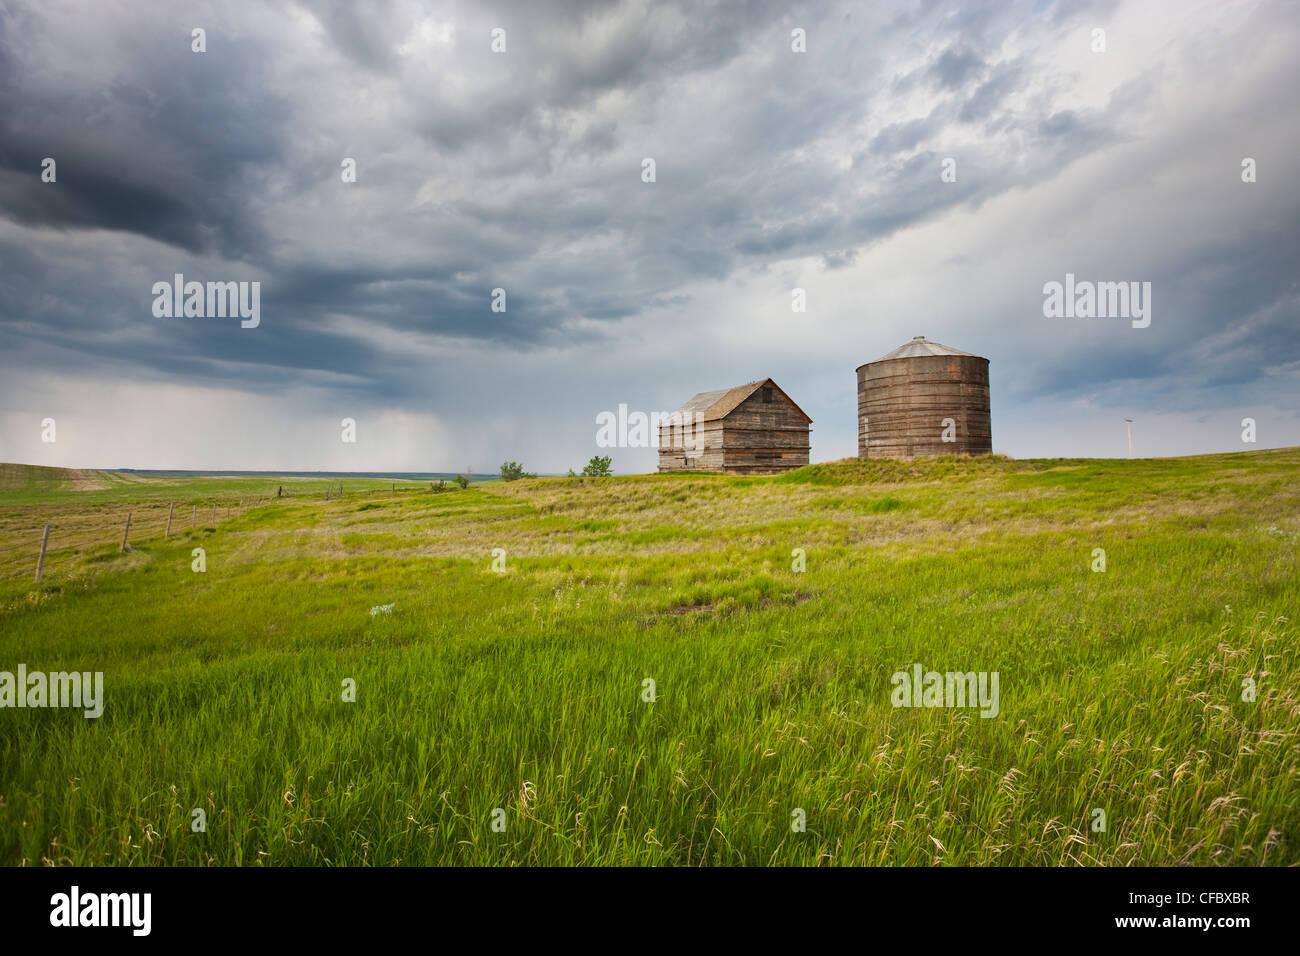 Storm brewing near Morse, Saskatchewan, Canada. - Stock Image